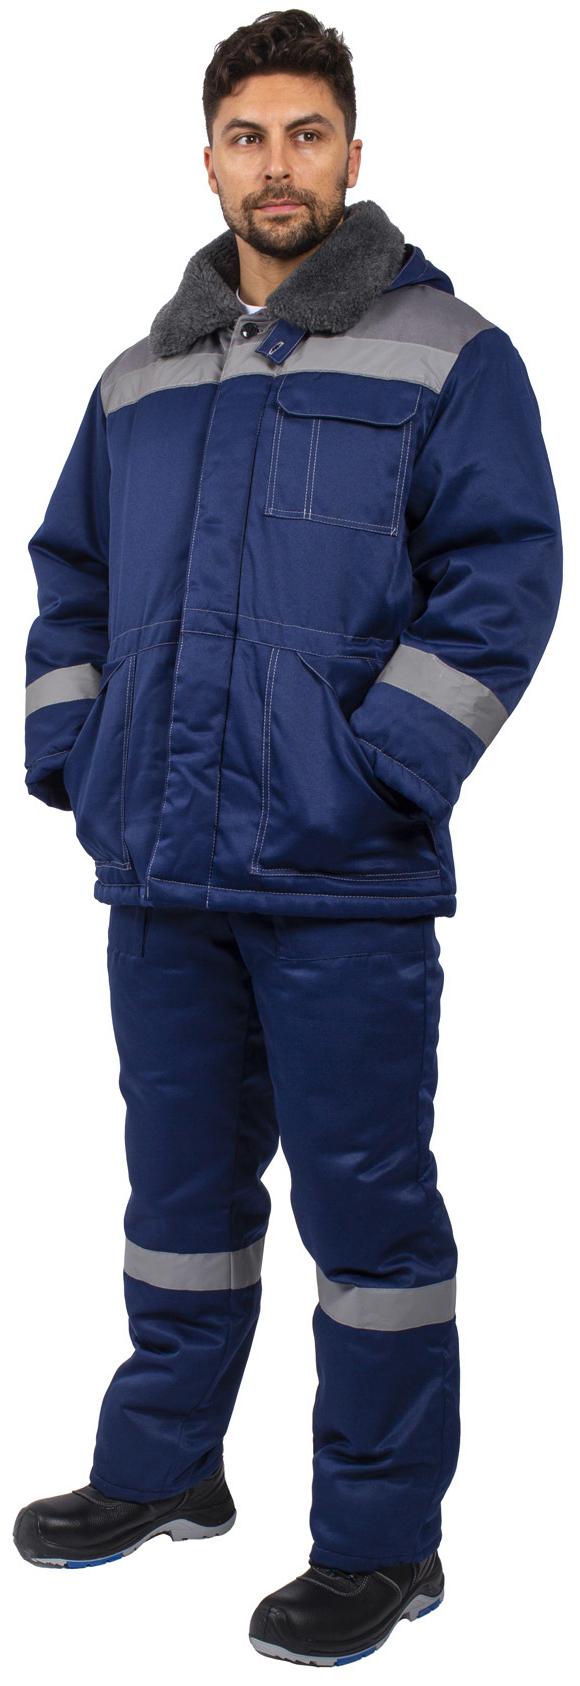 Костюм зимний Легион-Ультра СОП (тк.Смесовая,210) брюки, т.синий/серый